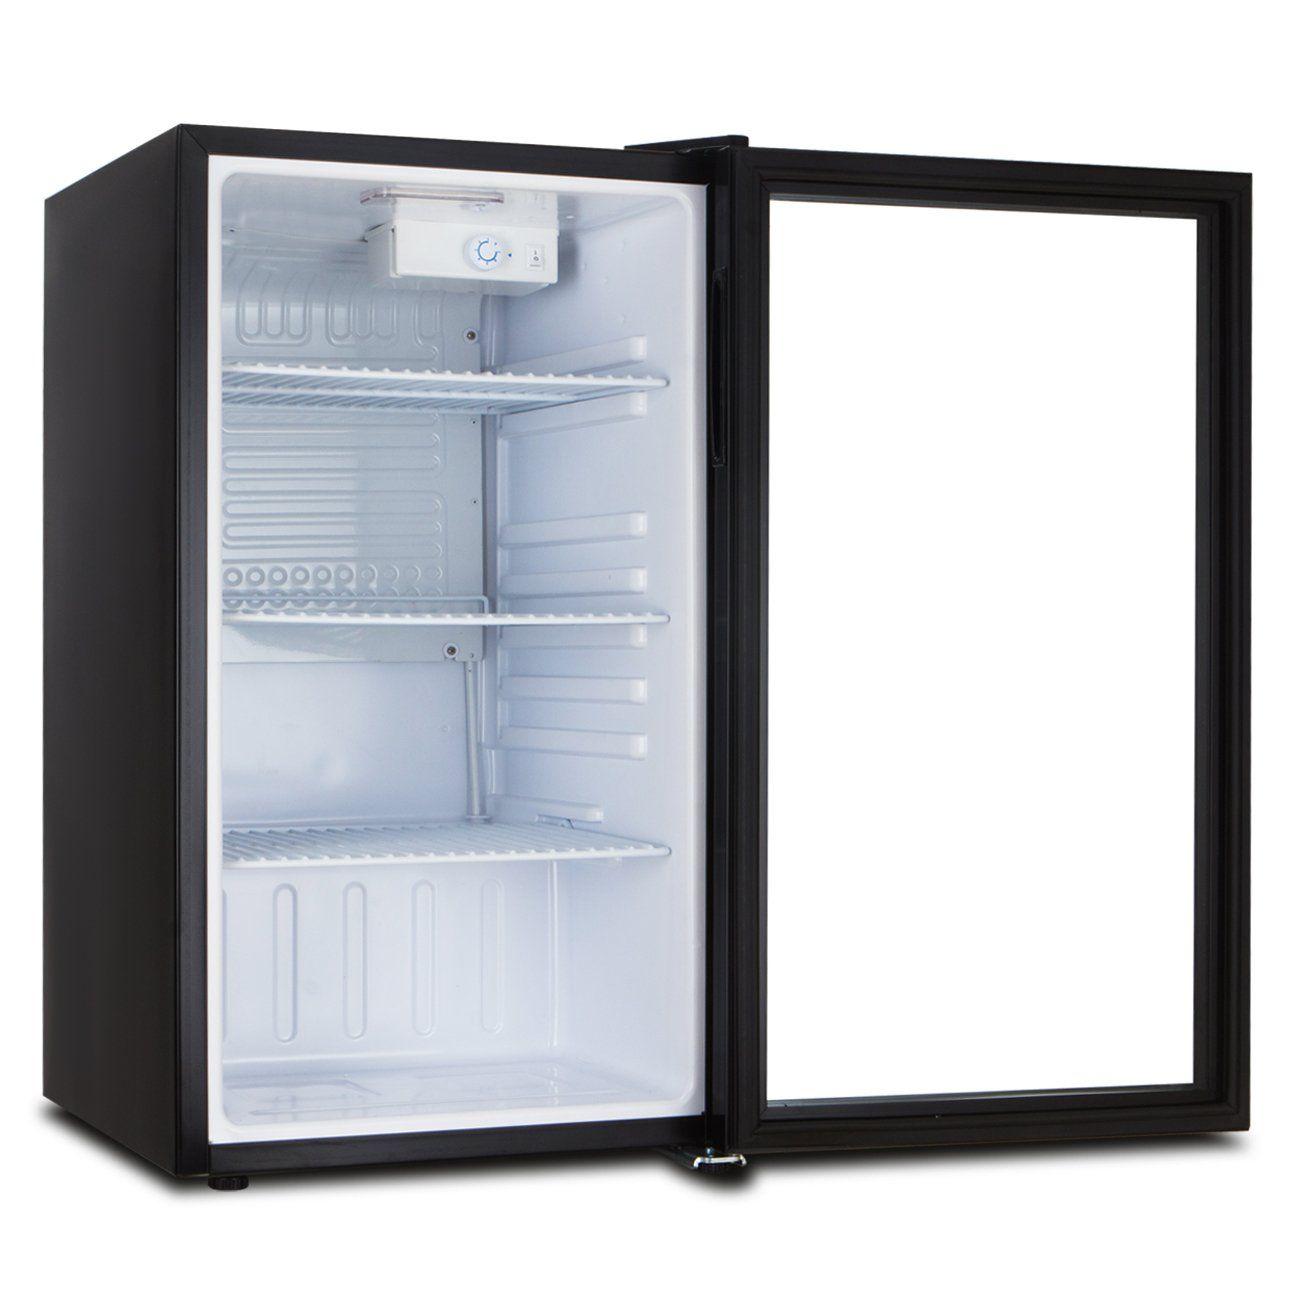 Della Beverage Refrigerator Cooler Compact Mini Bar Fridge Beer Soda Pop Reversible Glass Door Black Check Out Th Bar Fridges Mini Bar Beverage Refrigerator